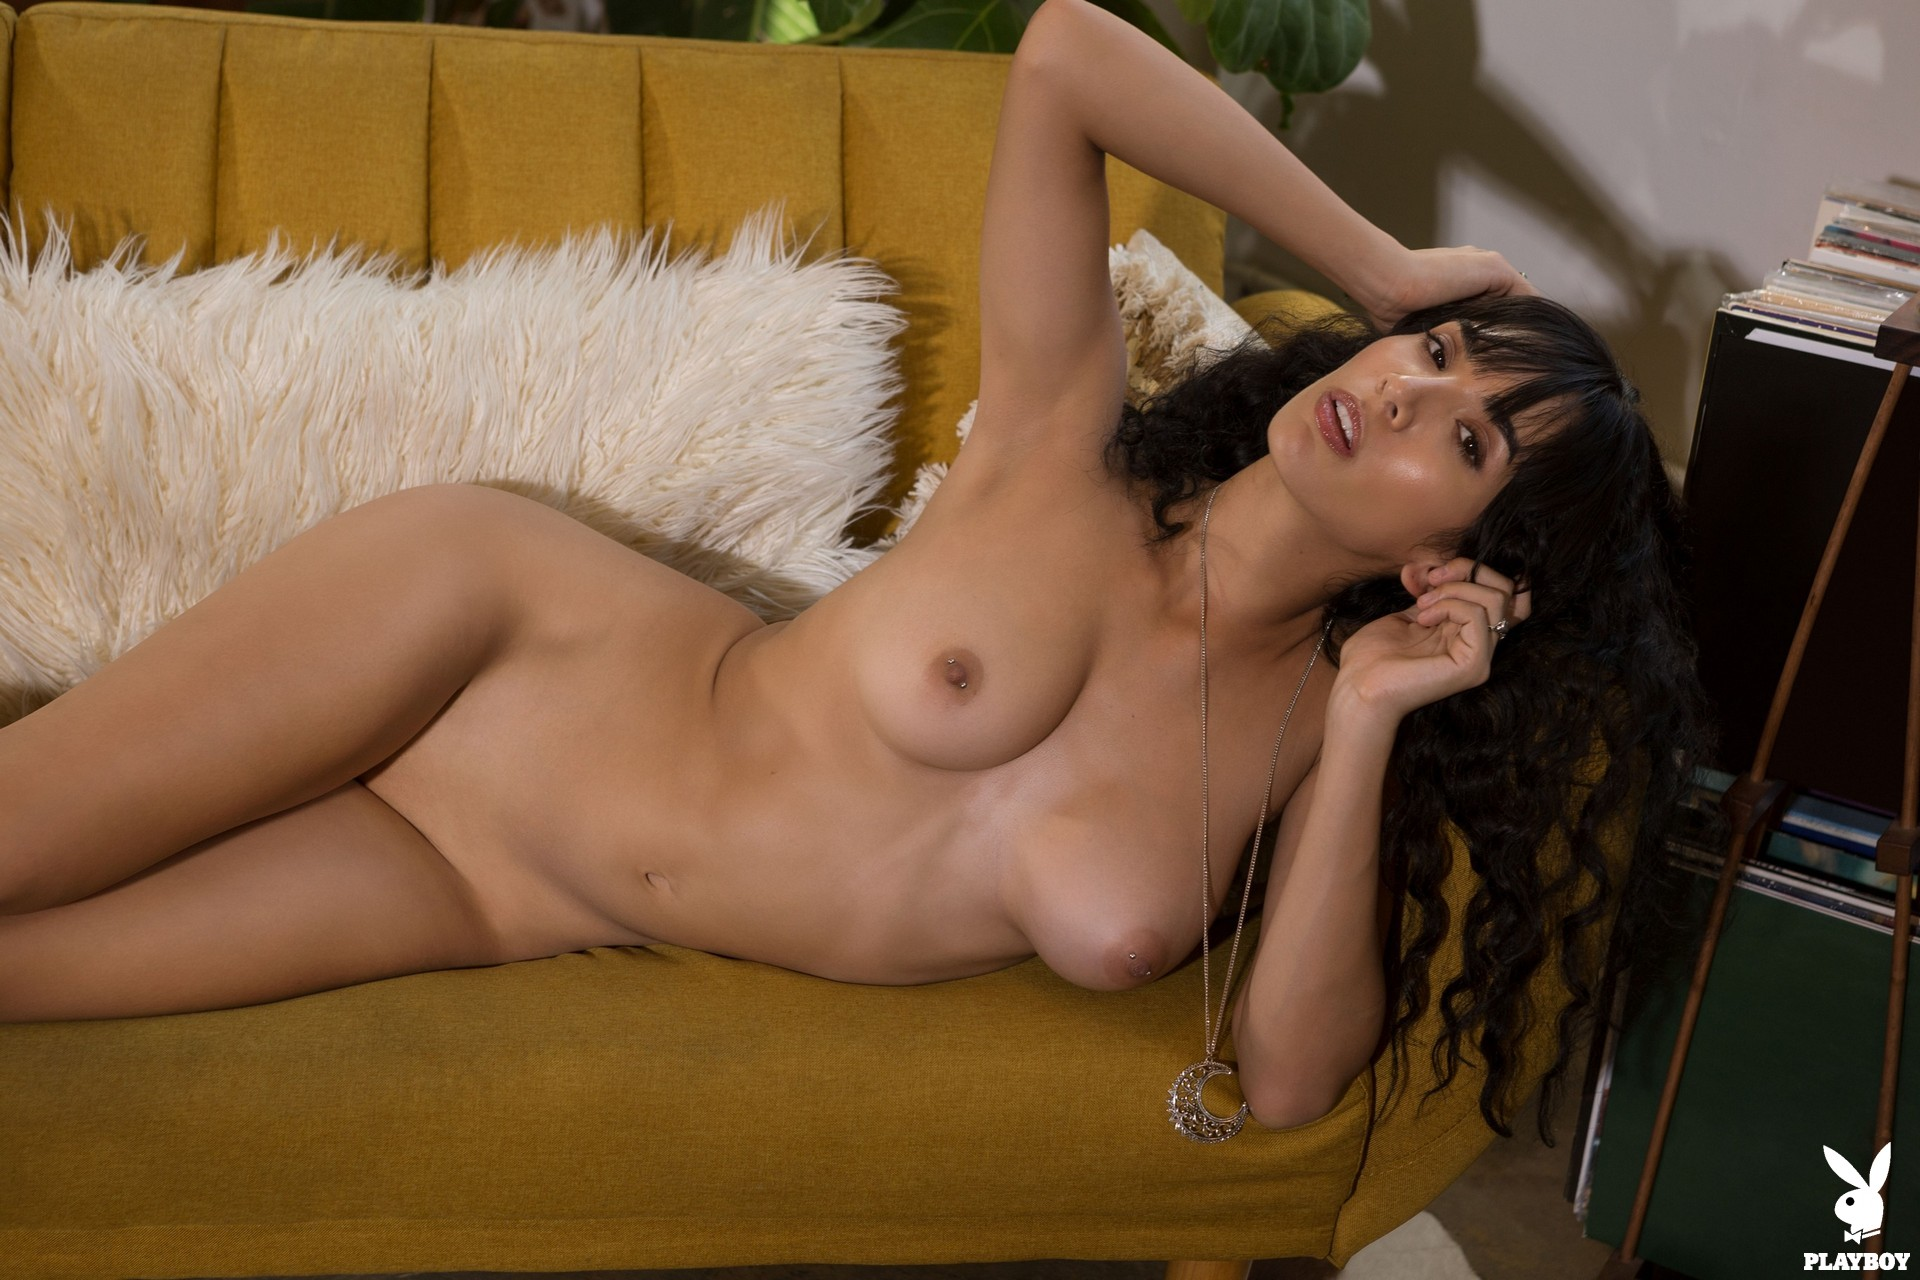 Erika De Leija in Funky and Free - Playboy Plus 27